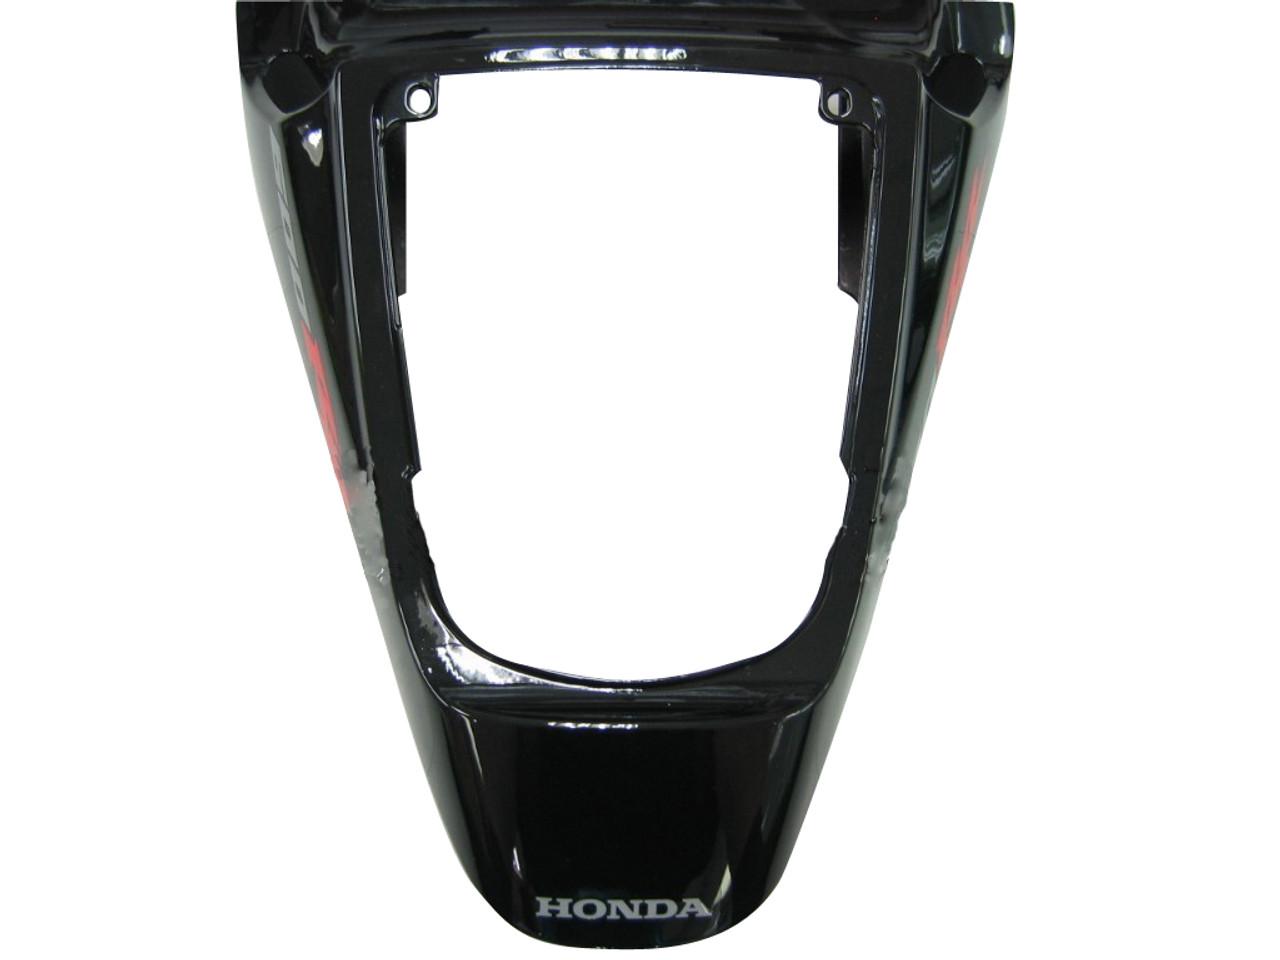 Fairings Honda CBR 600 RR Black & Silver CBR Racing (2003-2004)